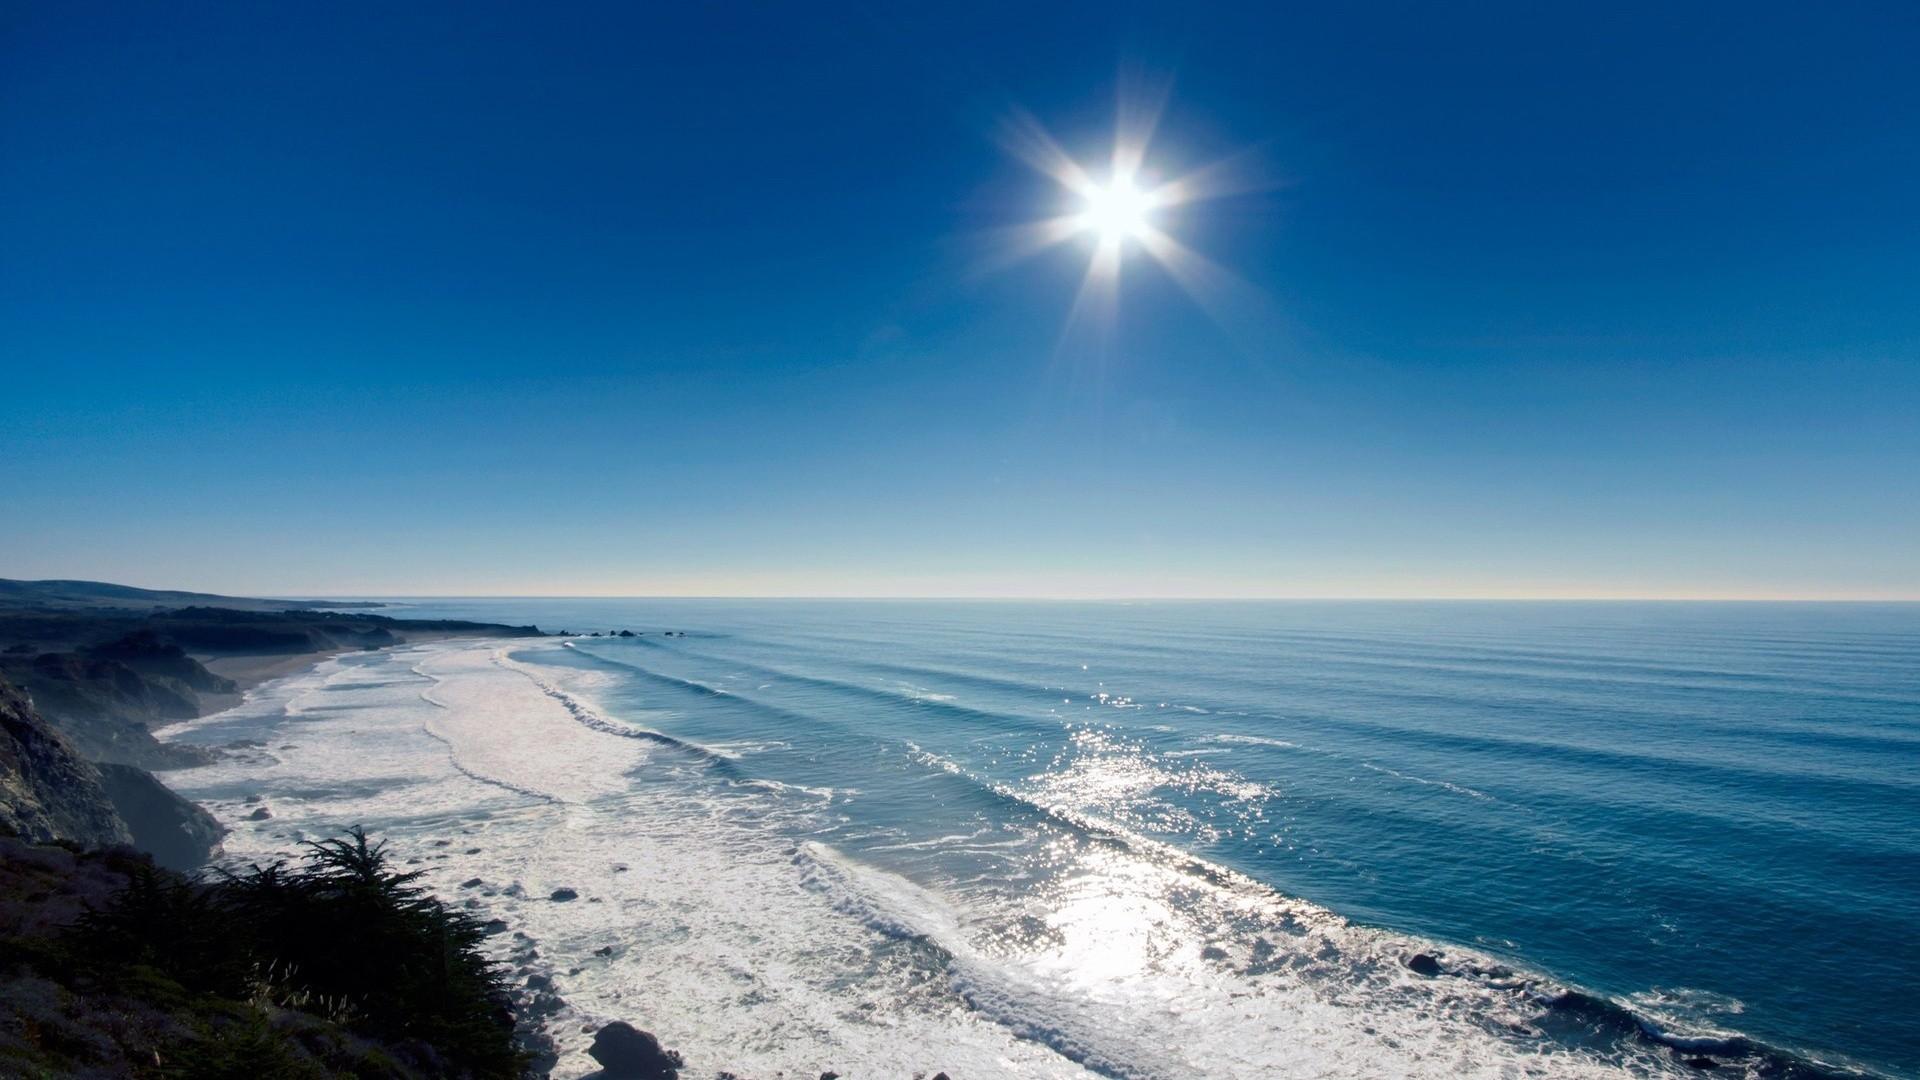 Ocean Beach Wallpaper 1920x1080 Ocean Beach 1920x1080